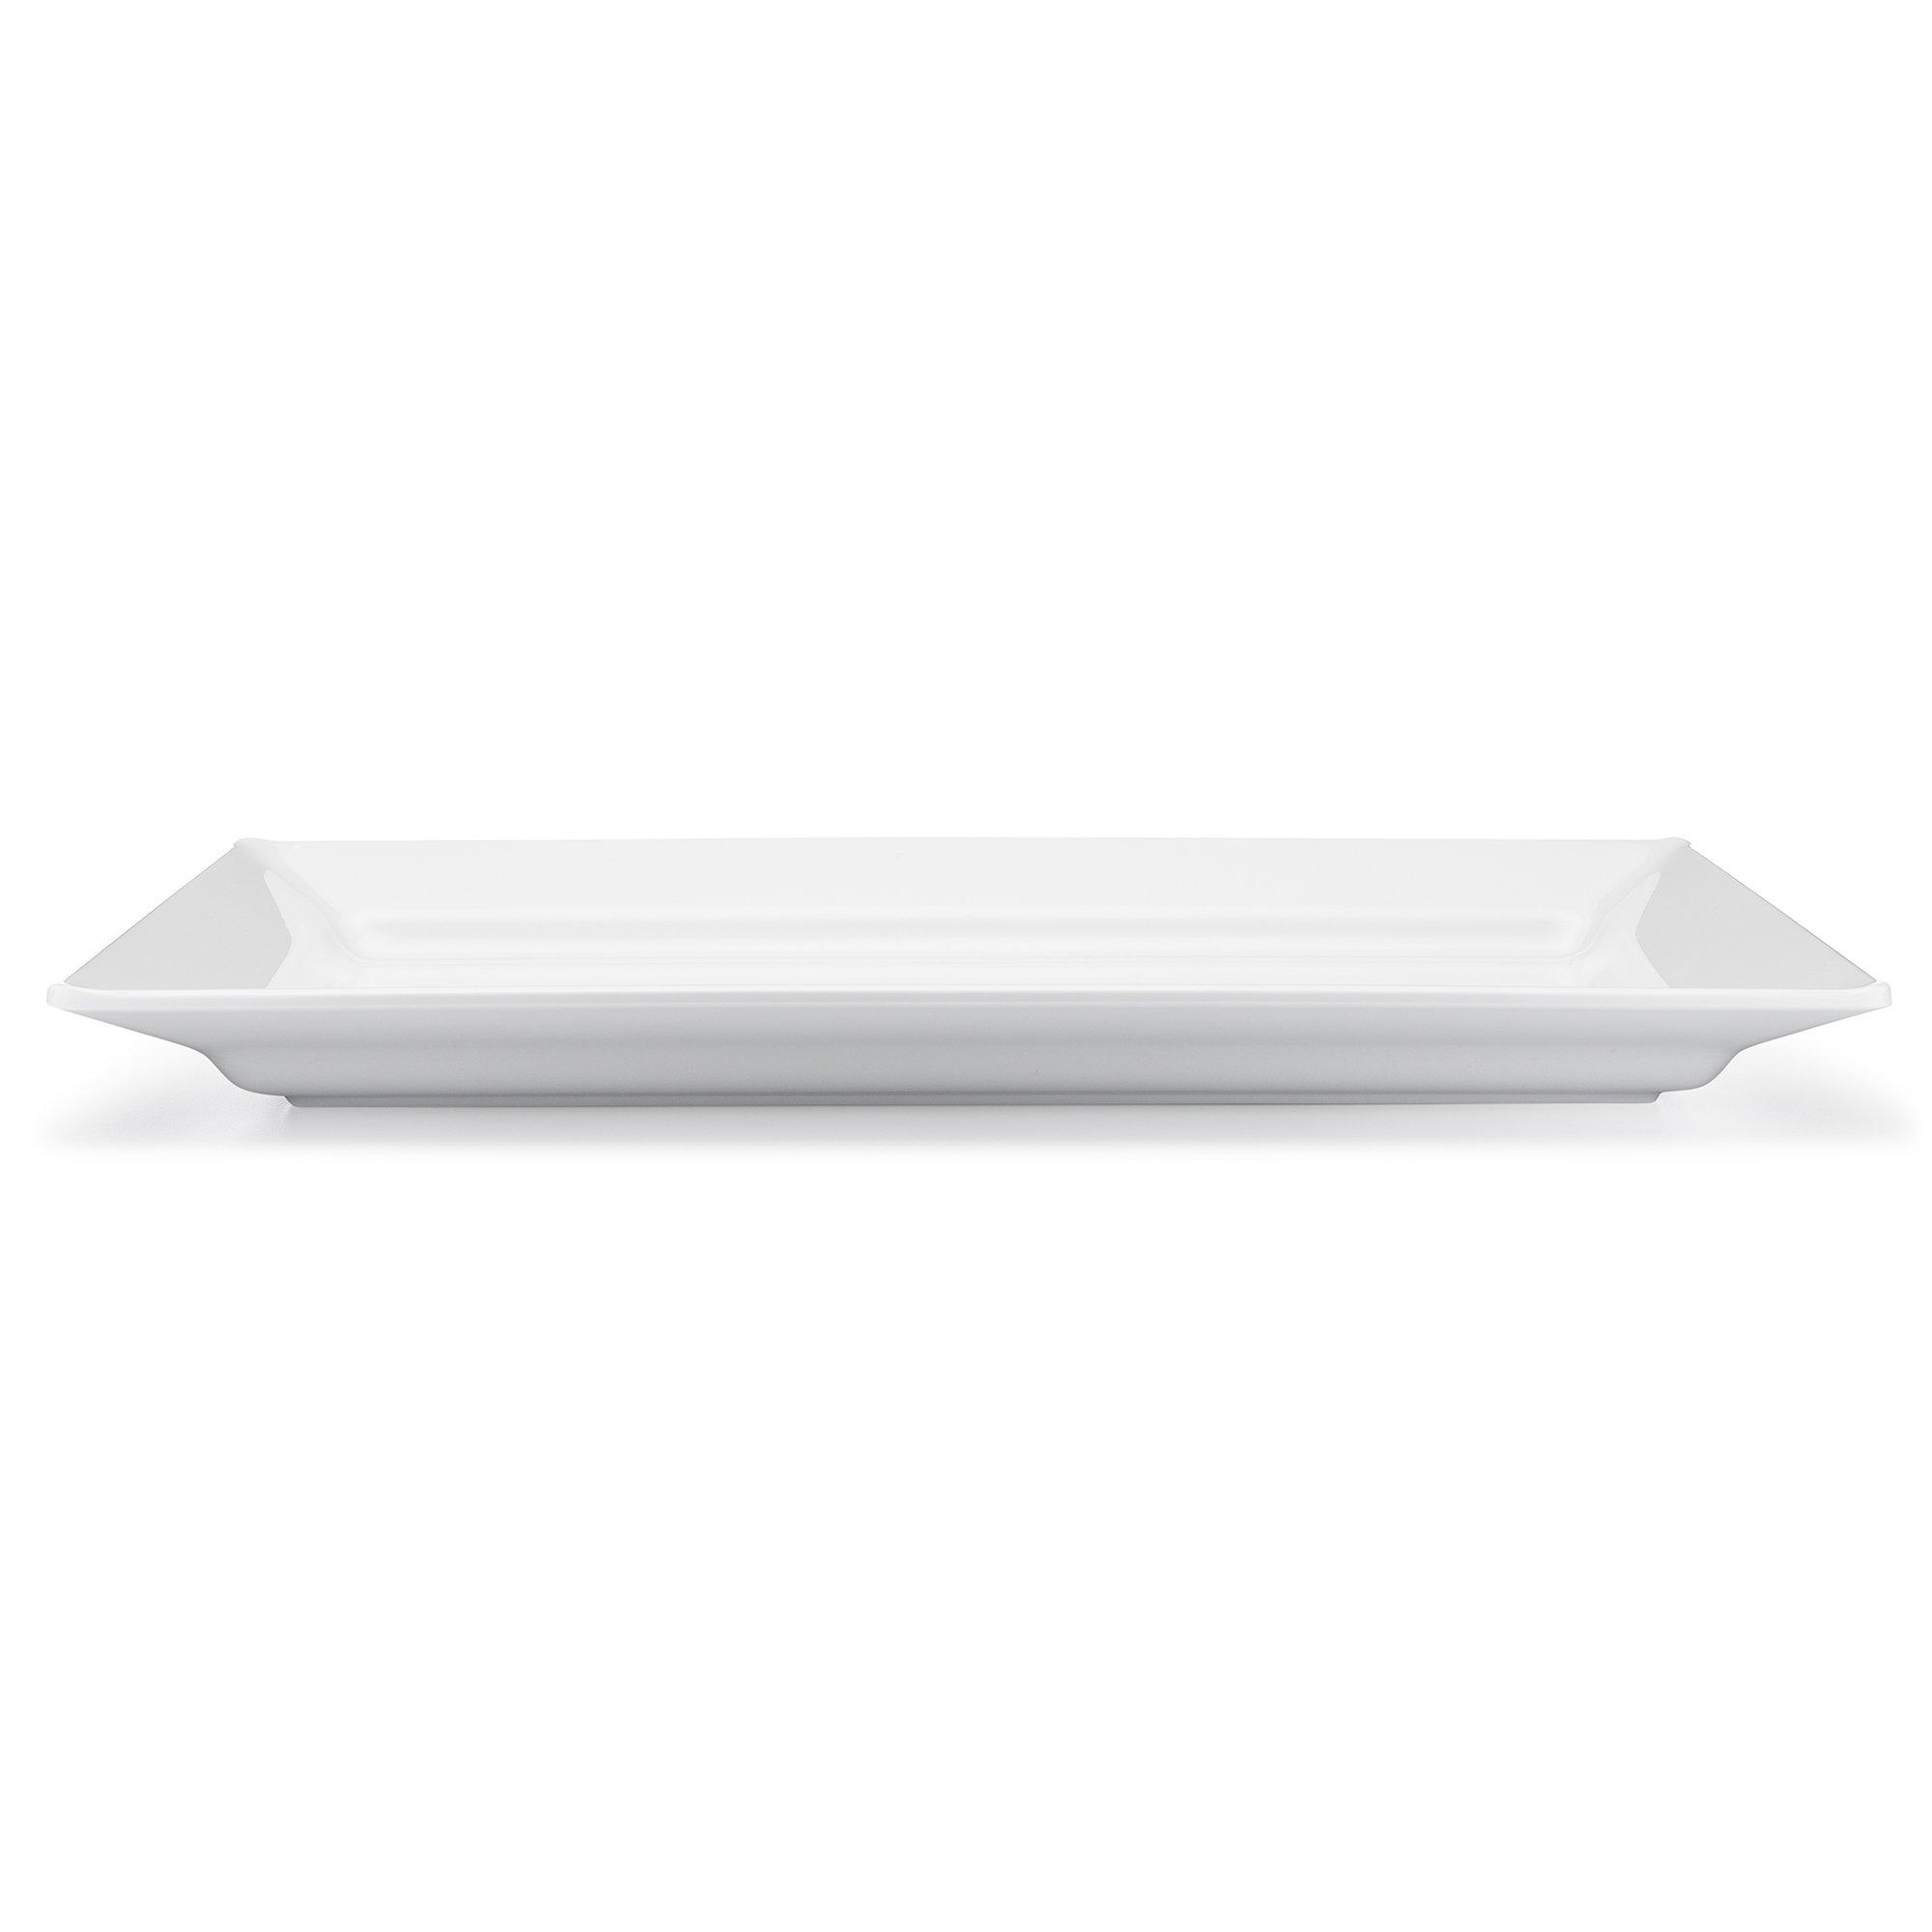 Q Squared Diamond White BPA-Free Melamine Large Rectangle Platter, 17-1/4 by 10-1/2, White by Q Squared (Image #3)